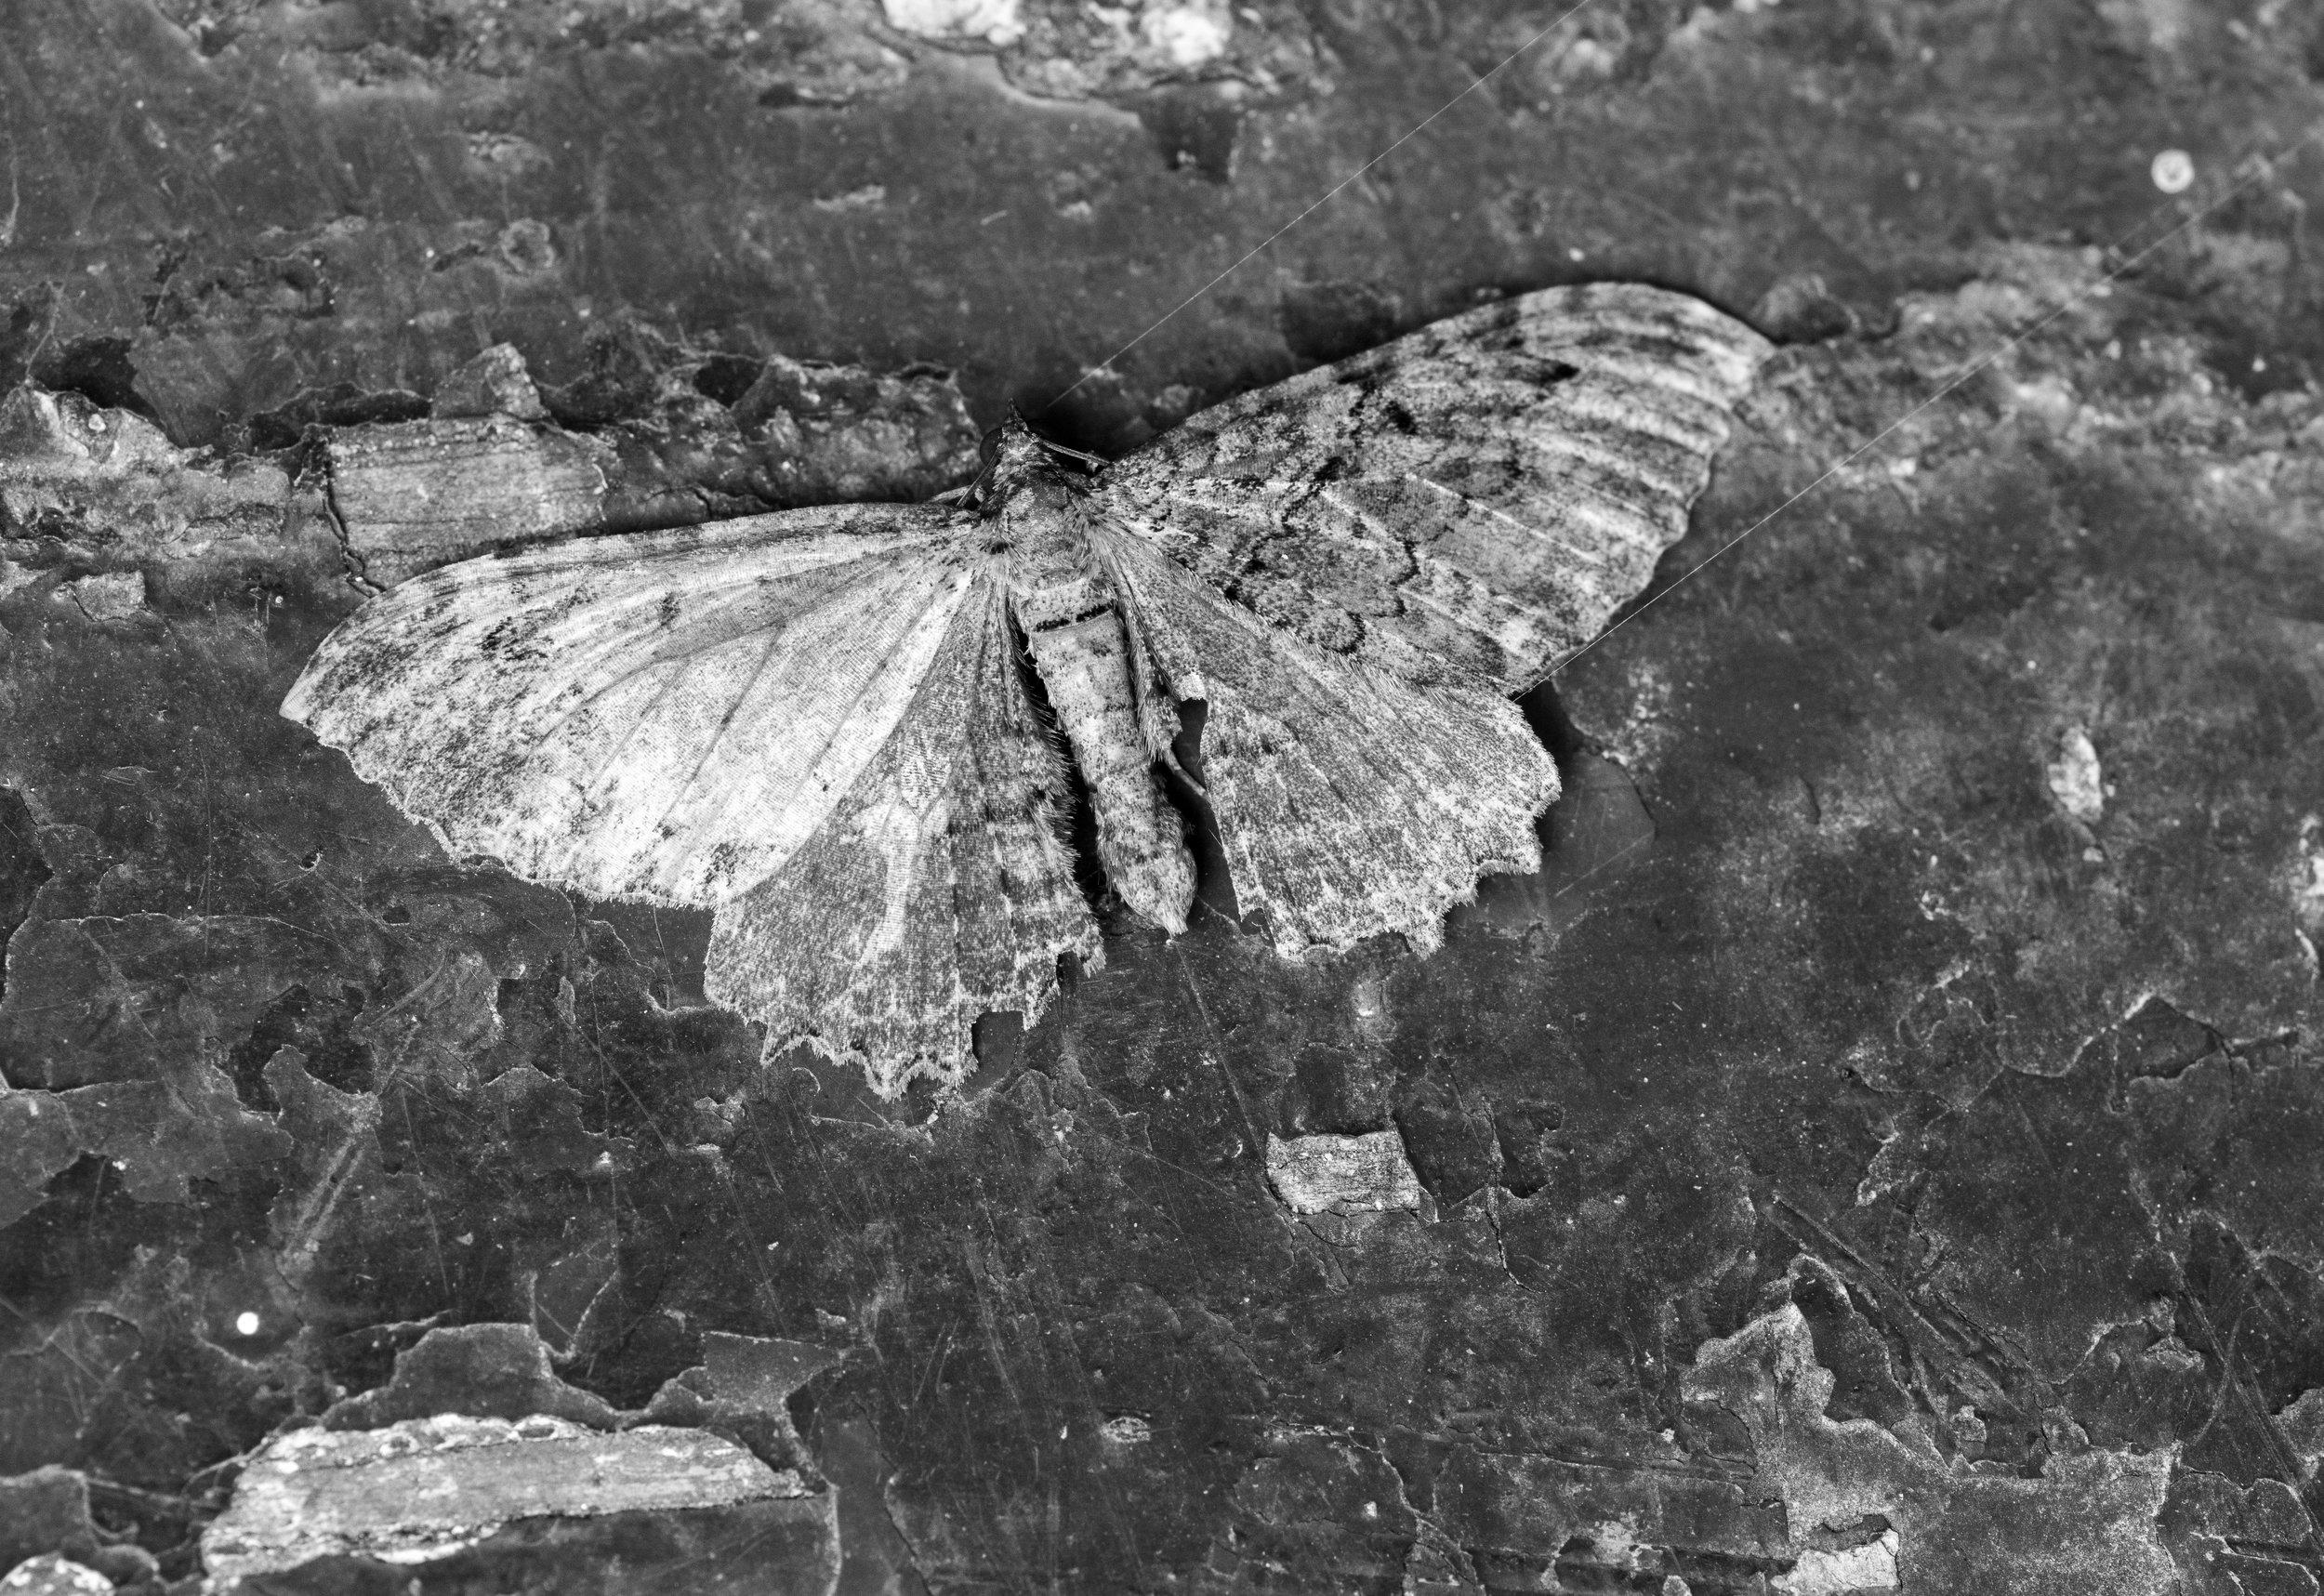 moth_on_chipped_paint.jpg